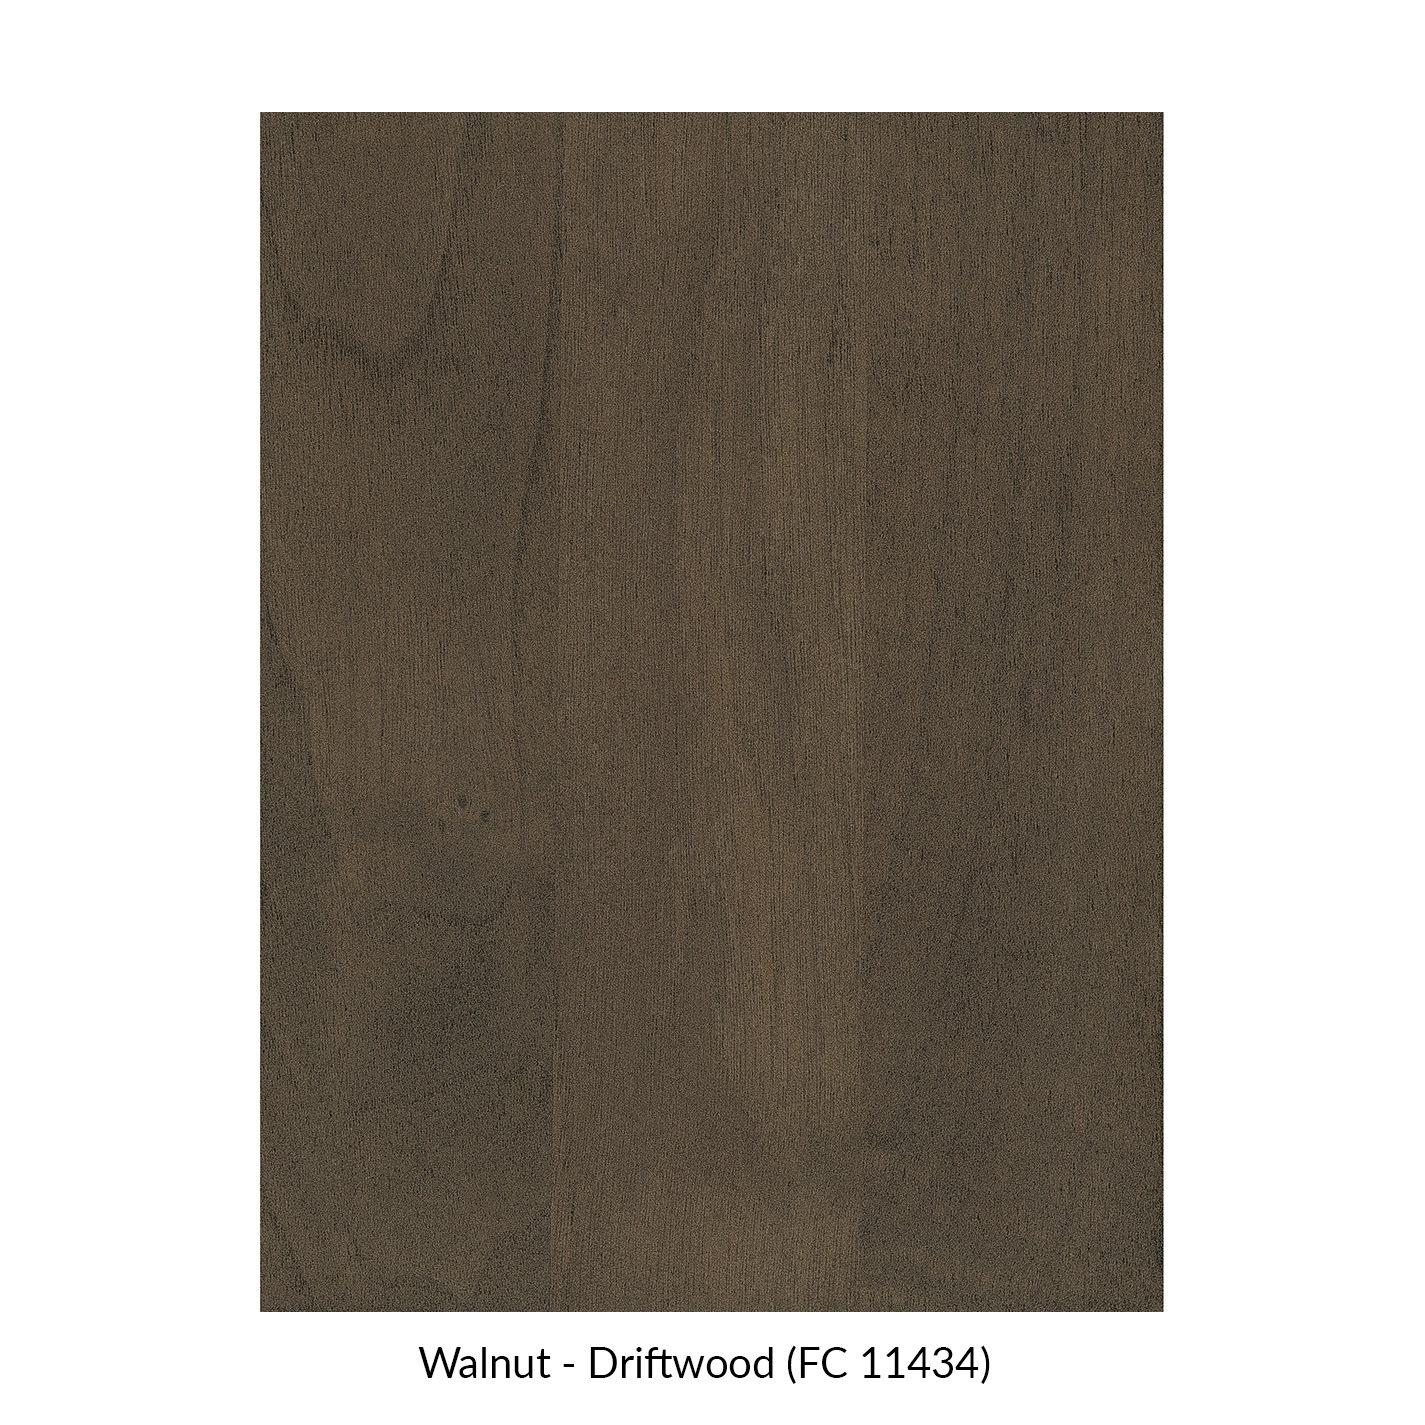 spectrum-walnut-driftwood-fc-11434.jpg